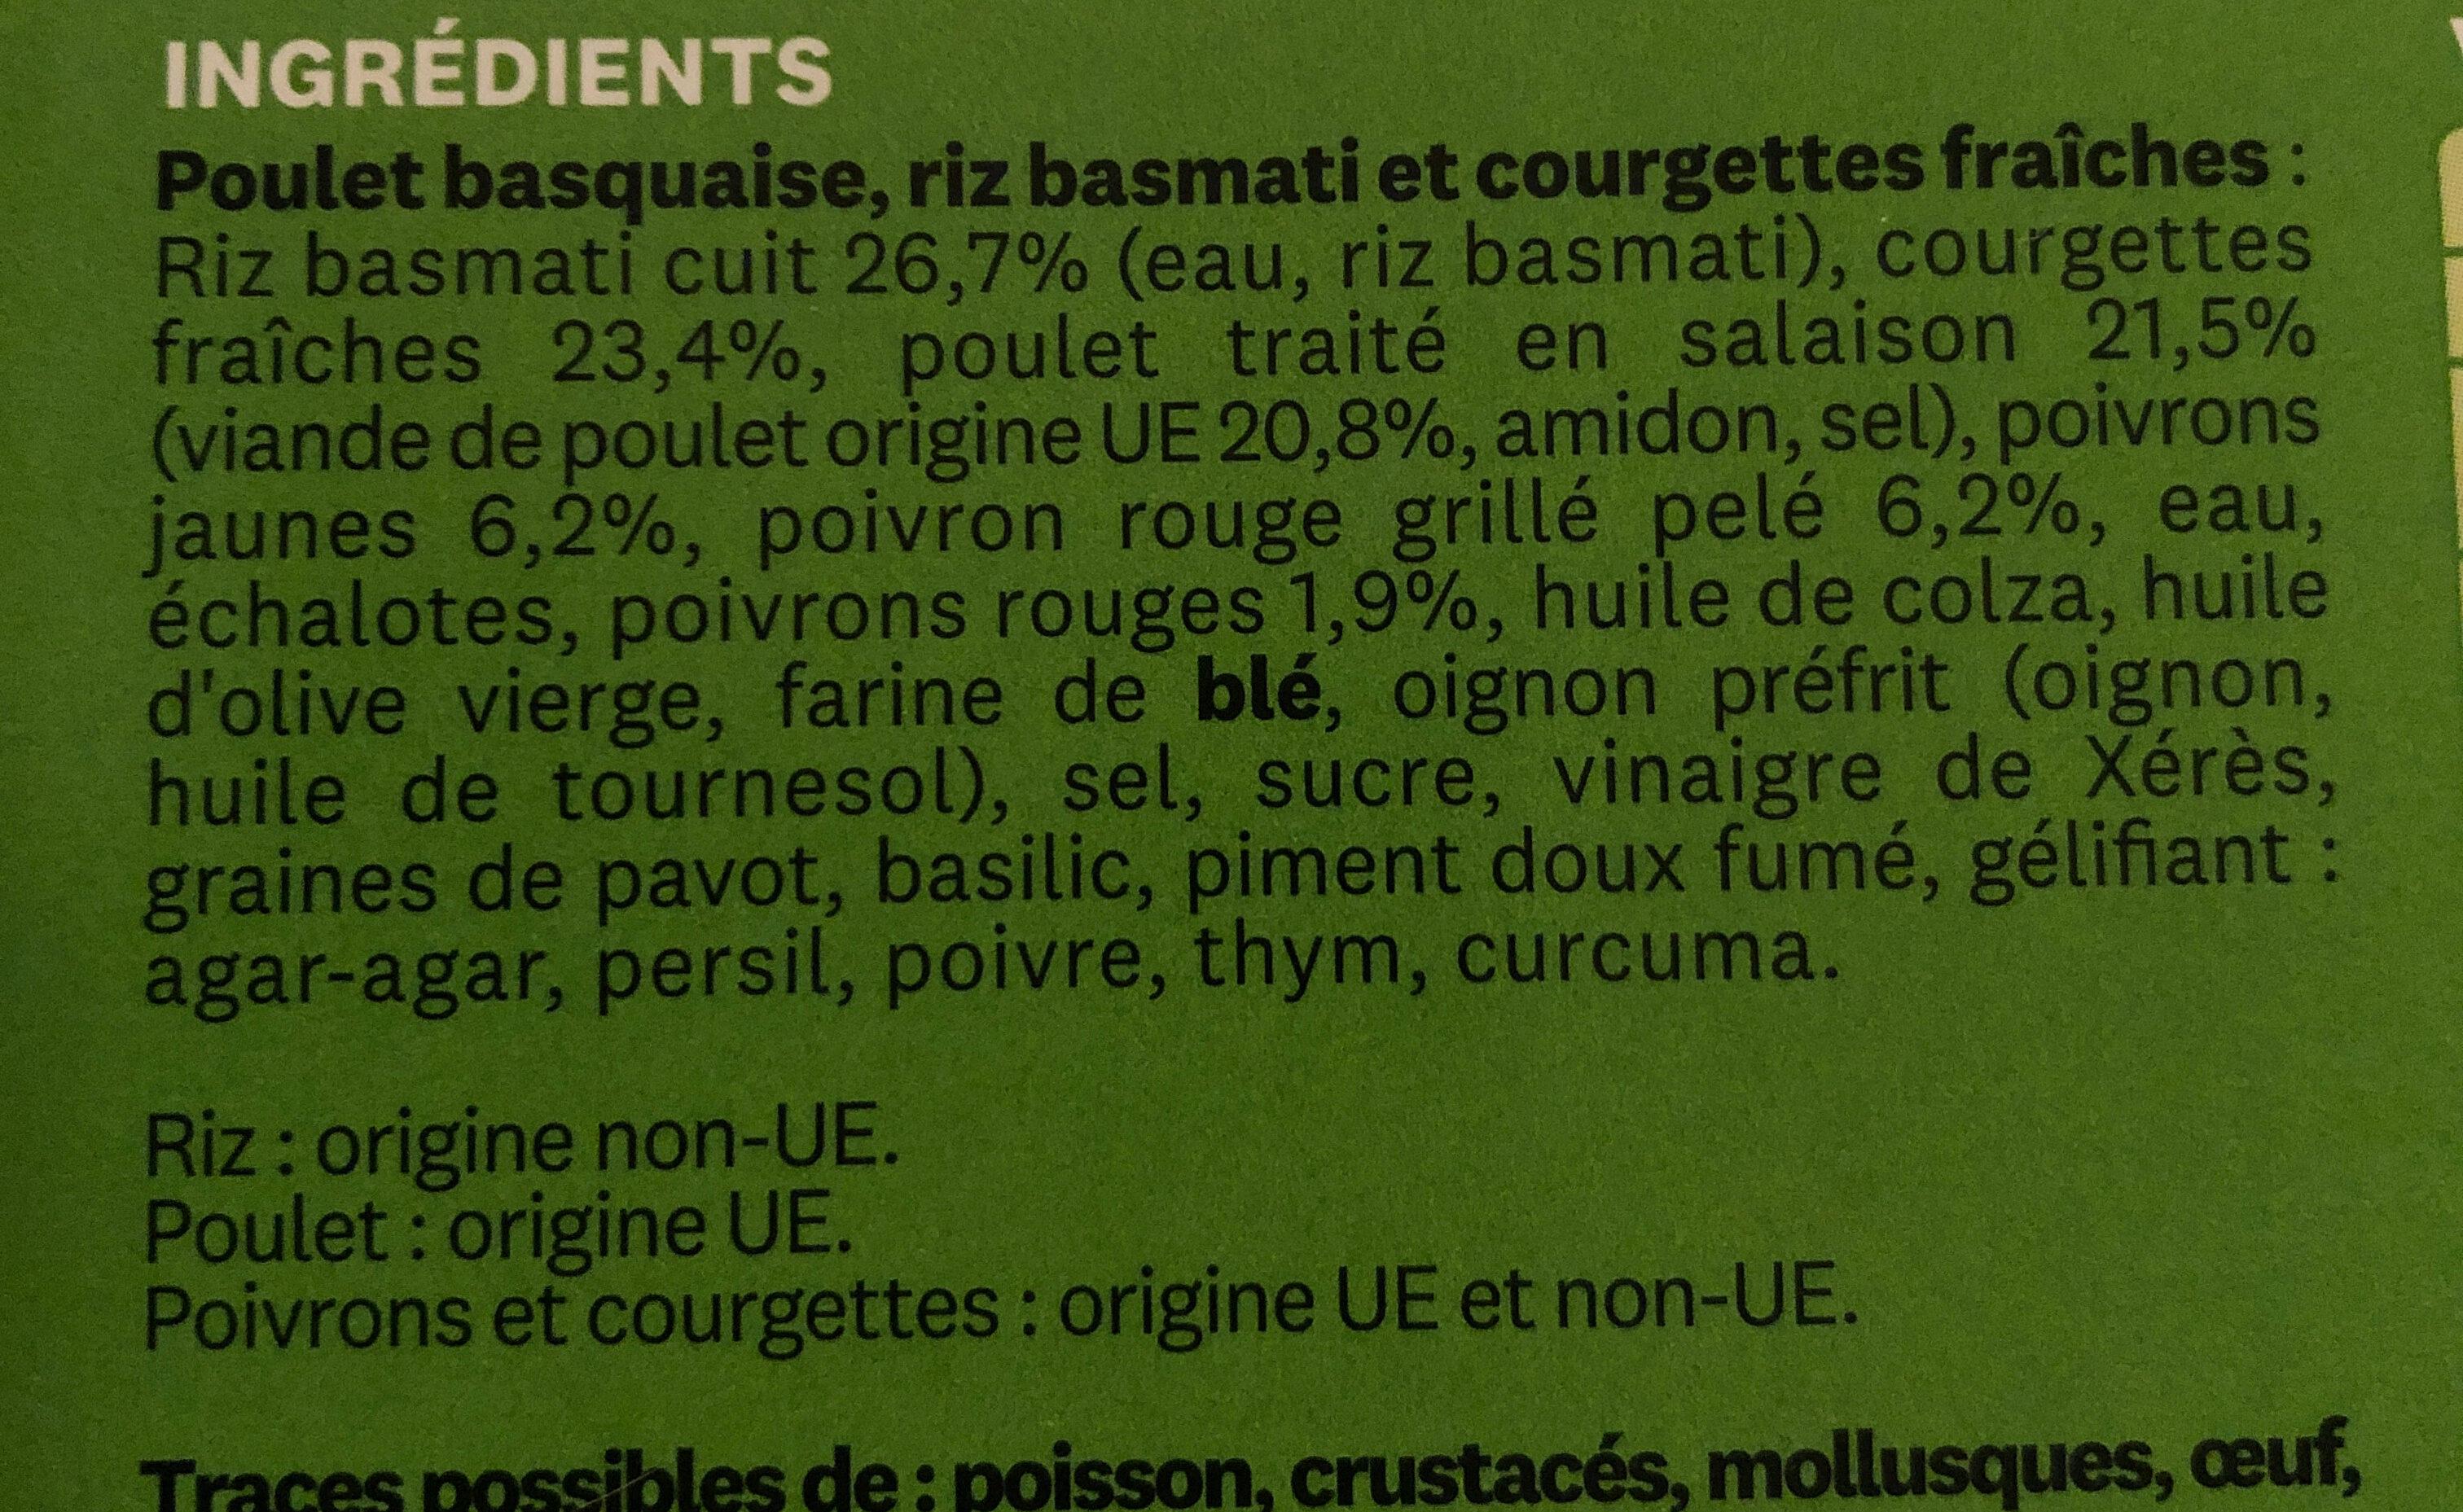 Poulet basquaise - Ingredients - fr